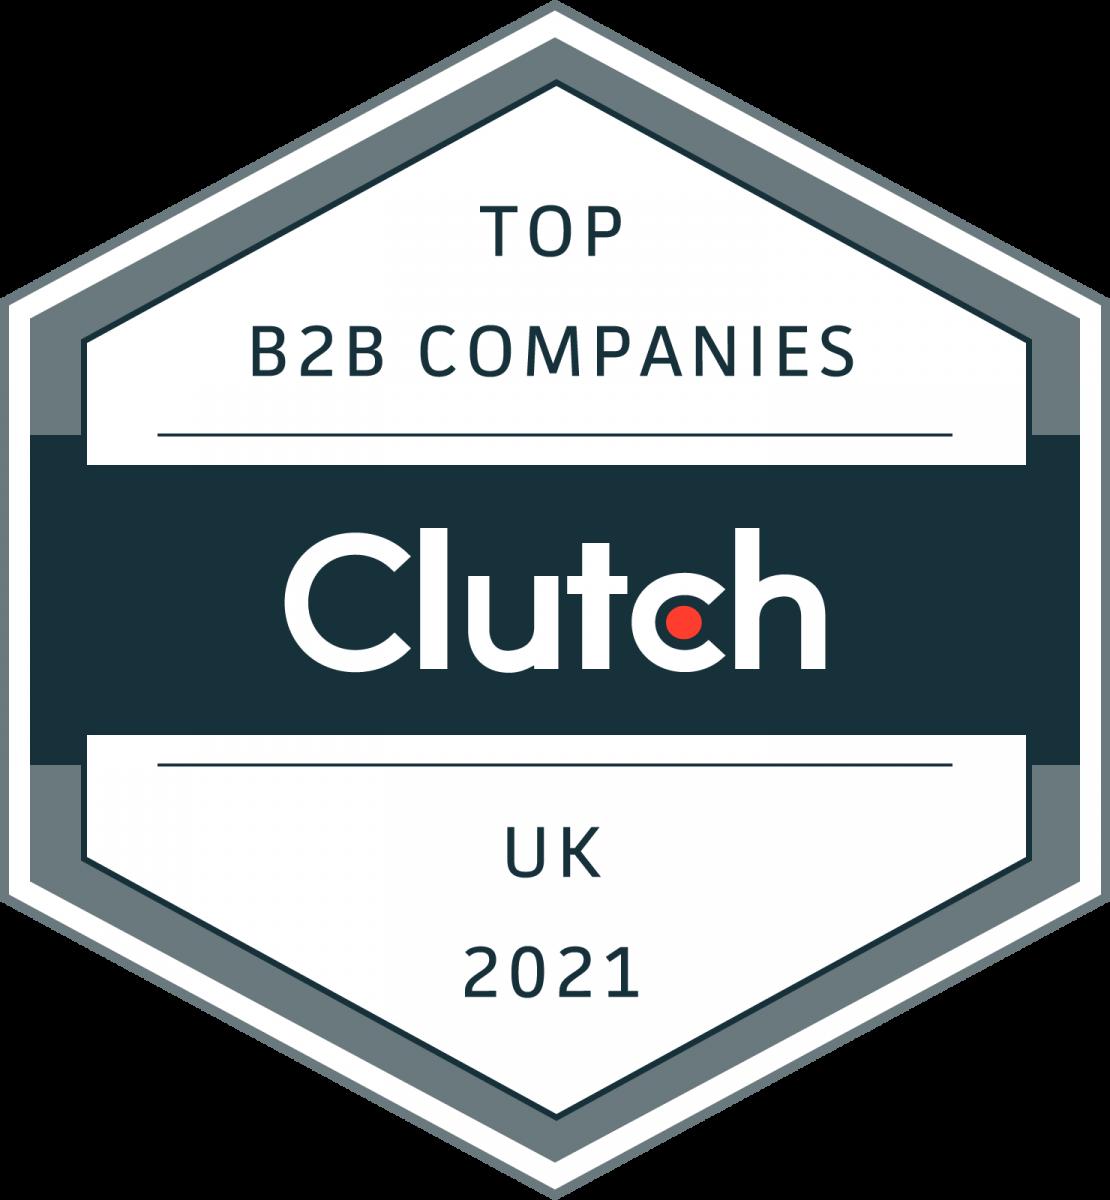 Top B2B Companies UK 2021